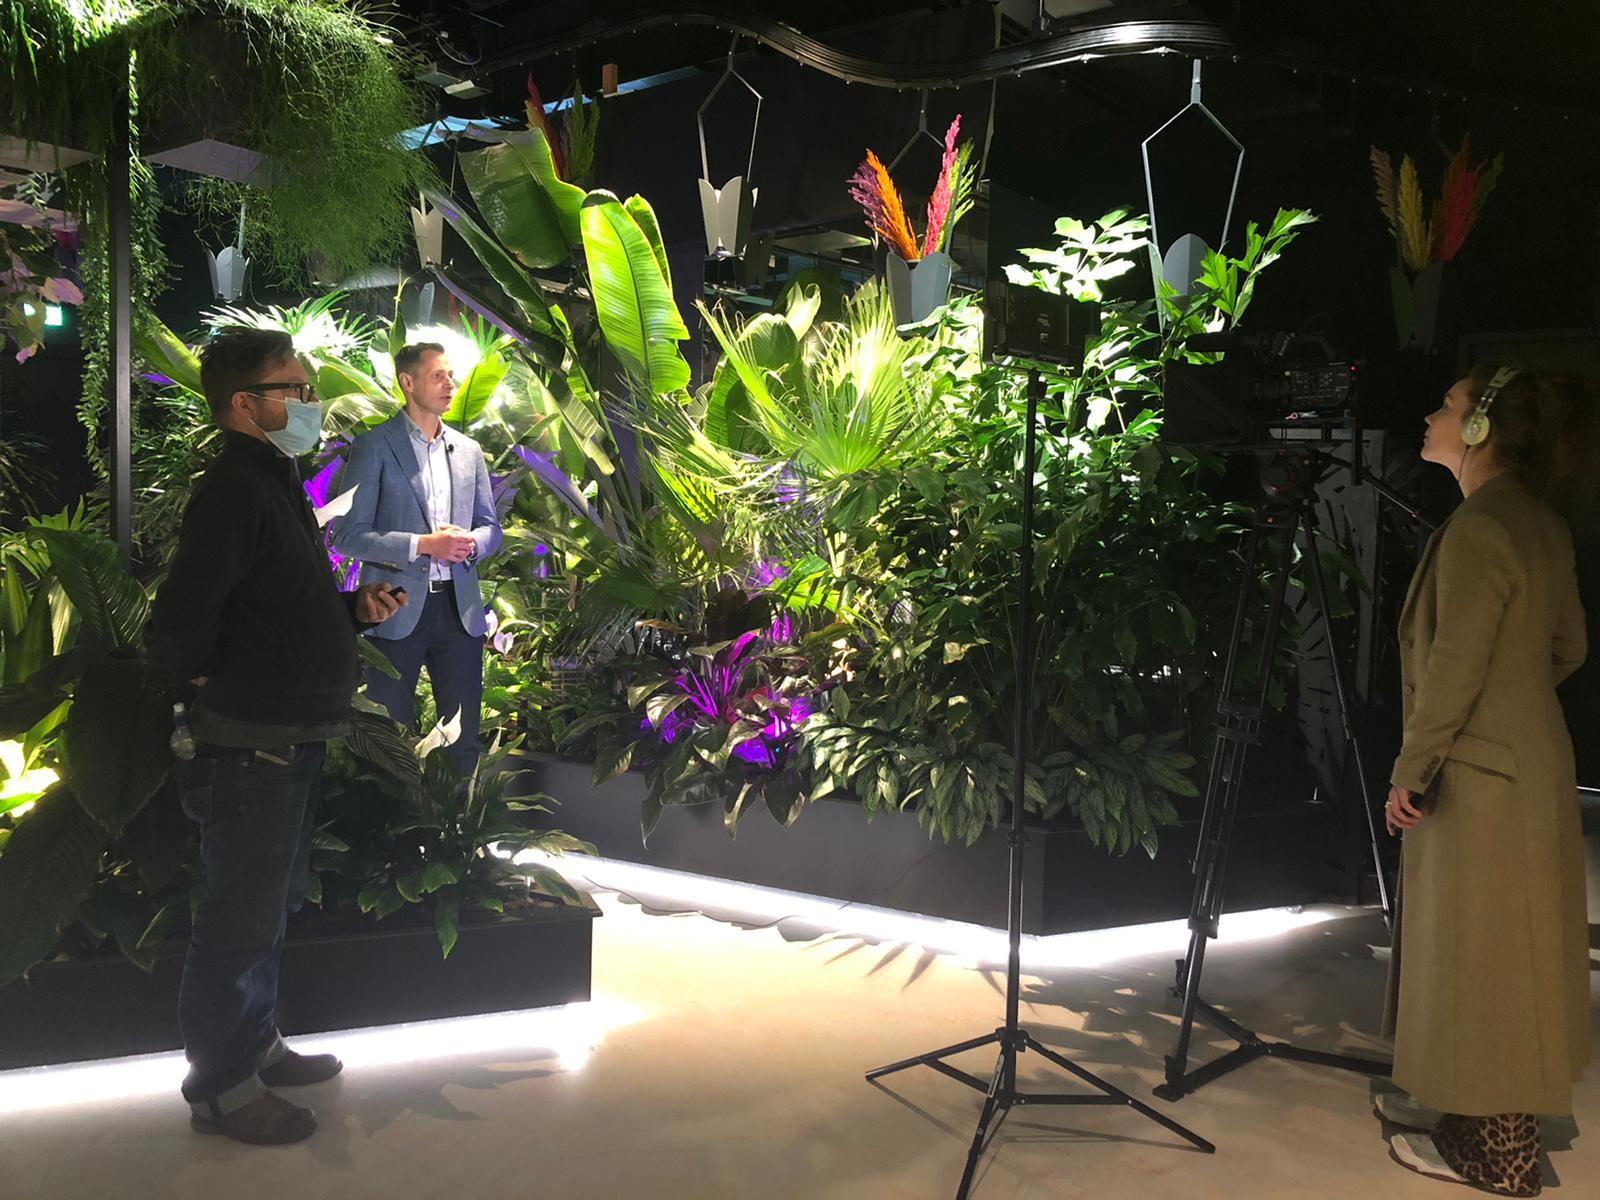 bloemenbureau-holland-jaarplannen-2021-2023